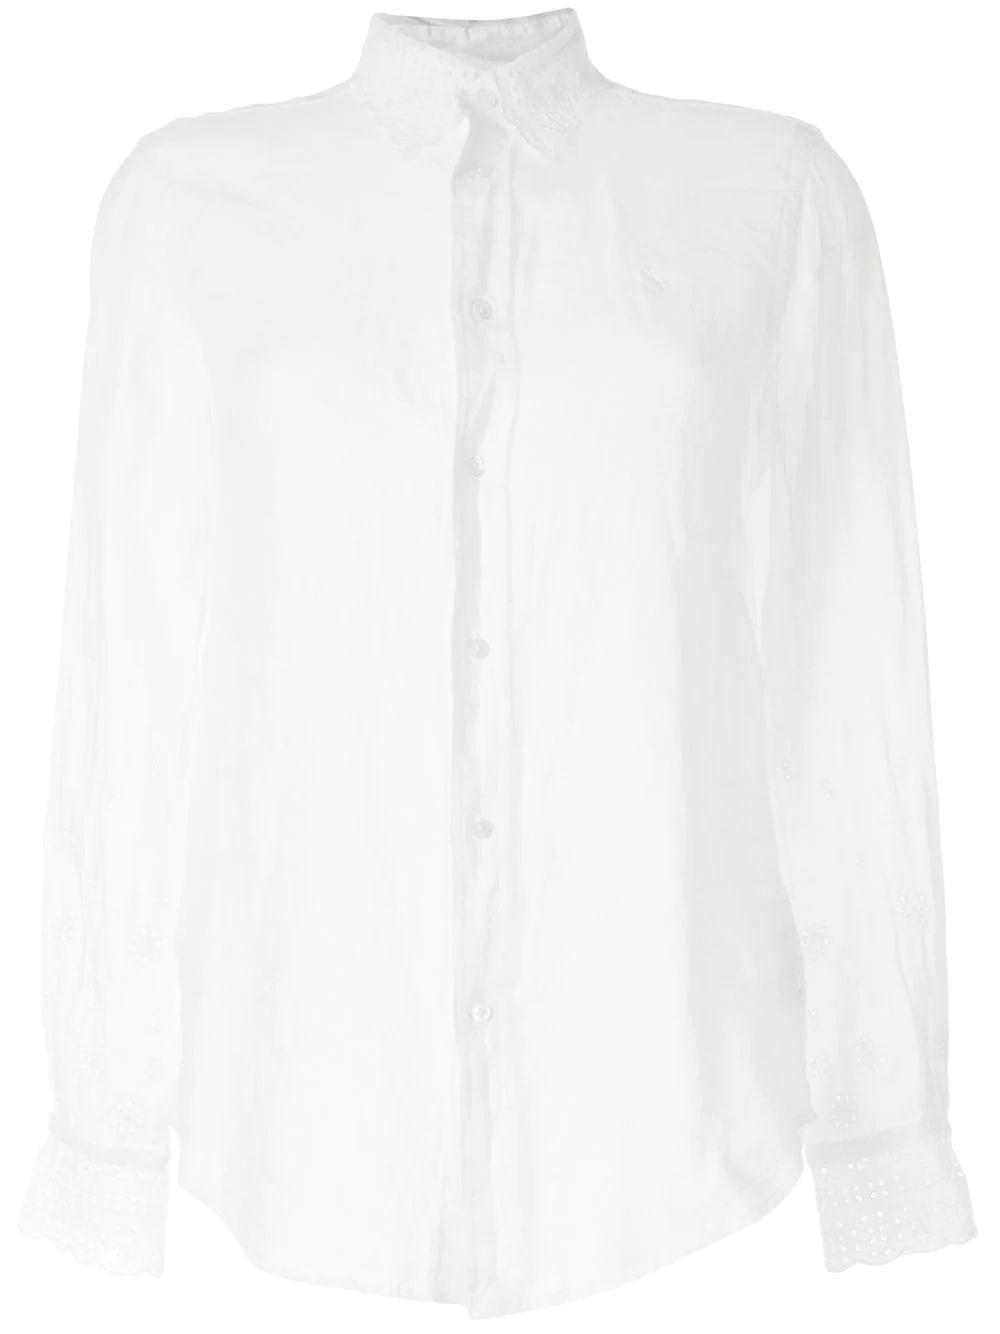 Georgia Button Down Shirt Item # 211792553001